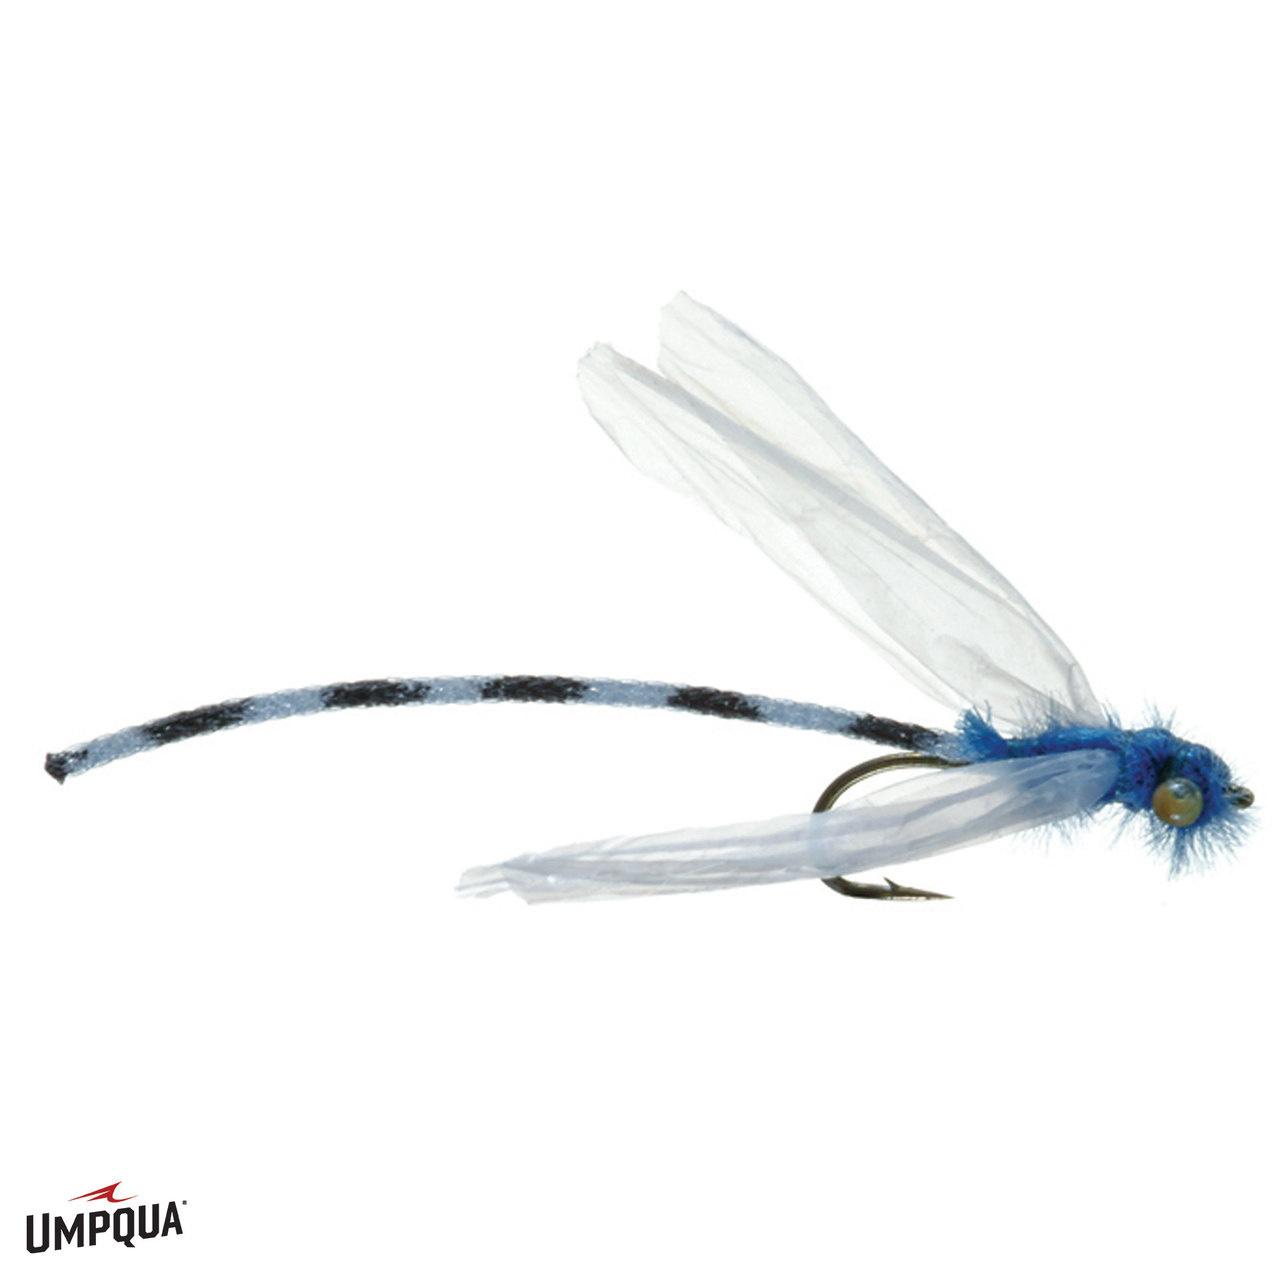 Umpqua Adult Damsel Flies